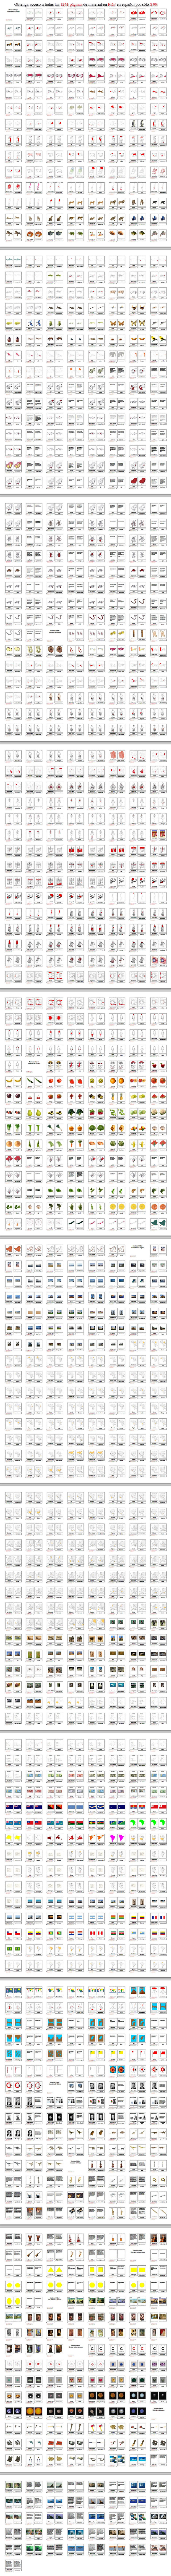 Montessori Spanish Materials Catalogue